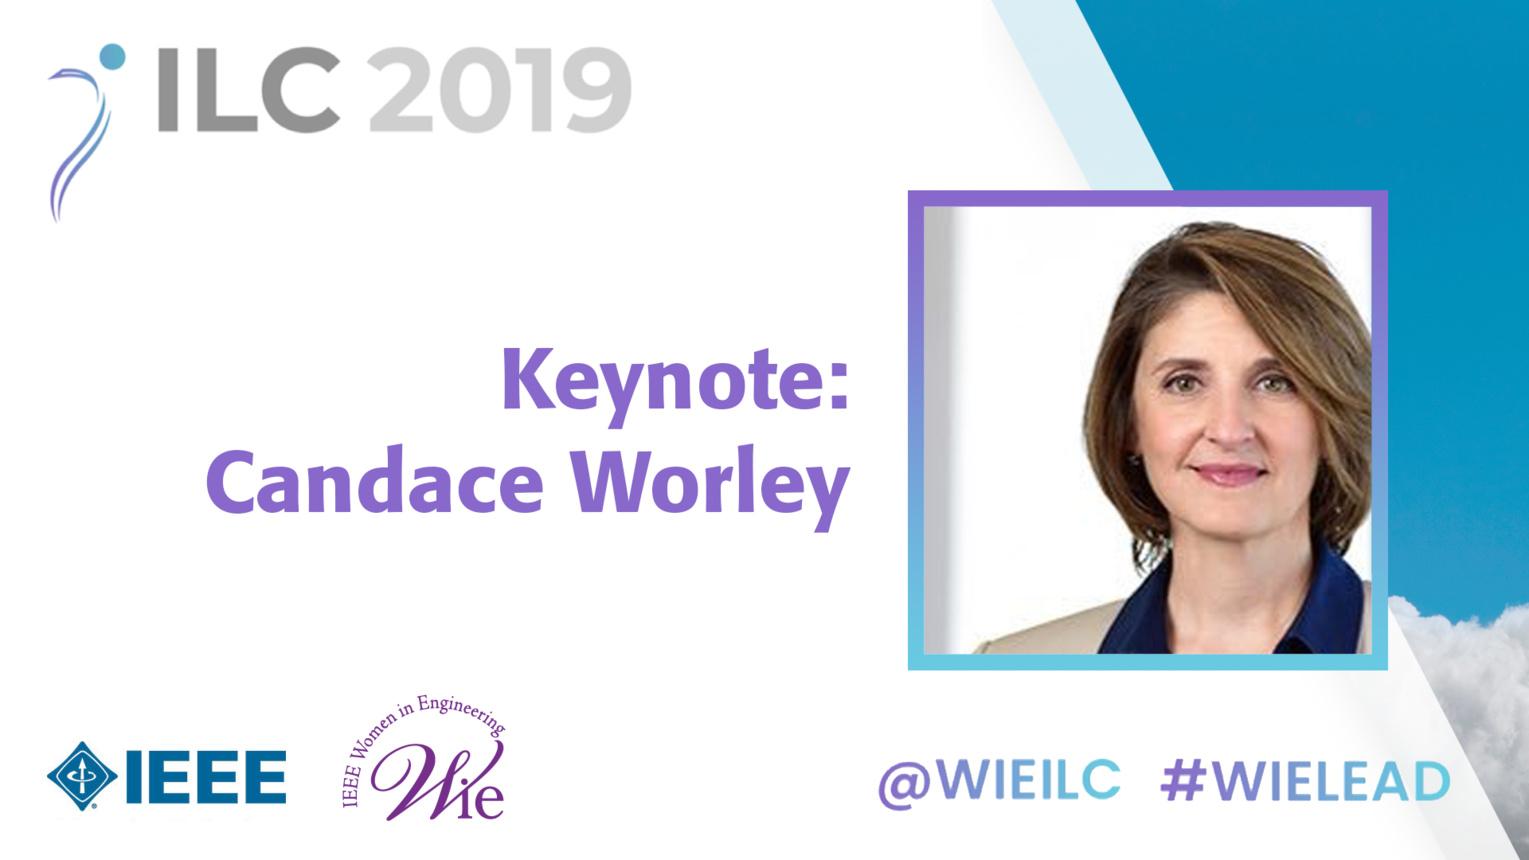 Keynote: Candace Worley - WIE ILC 2019